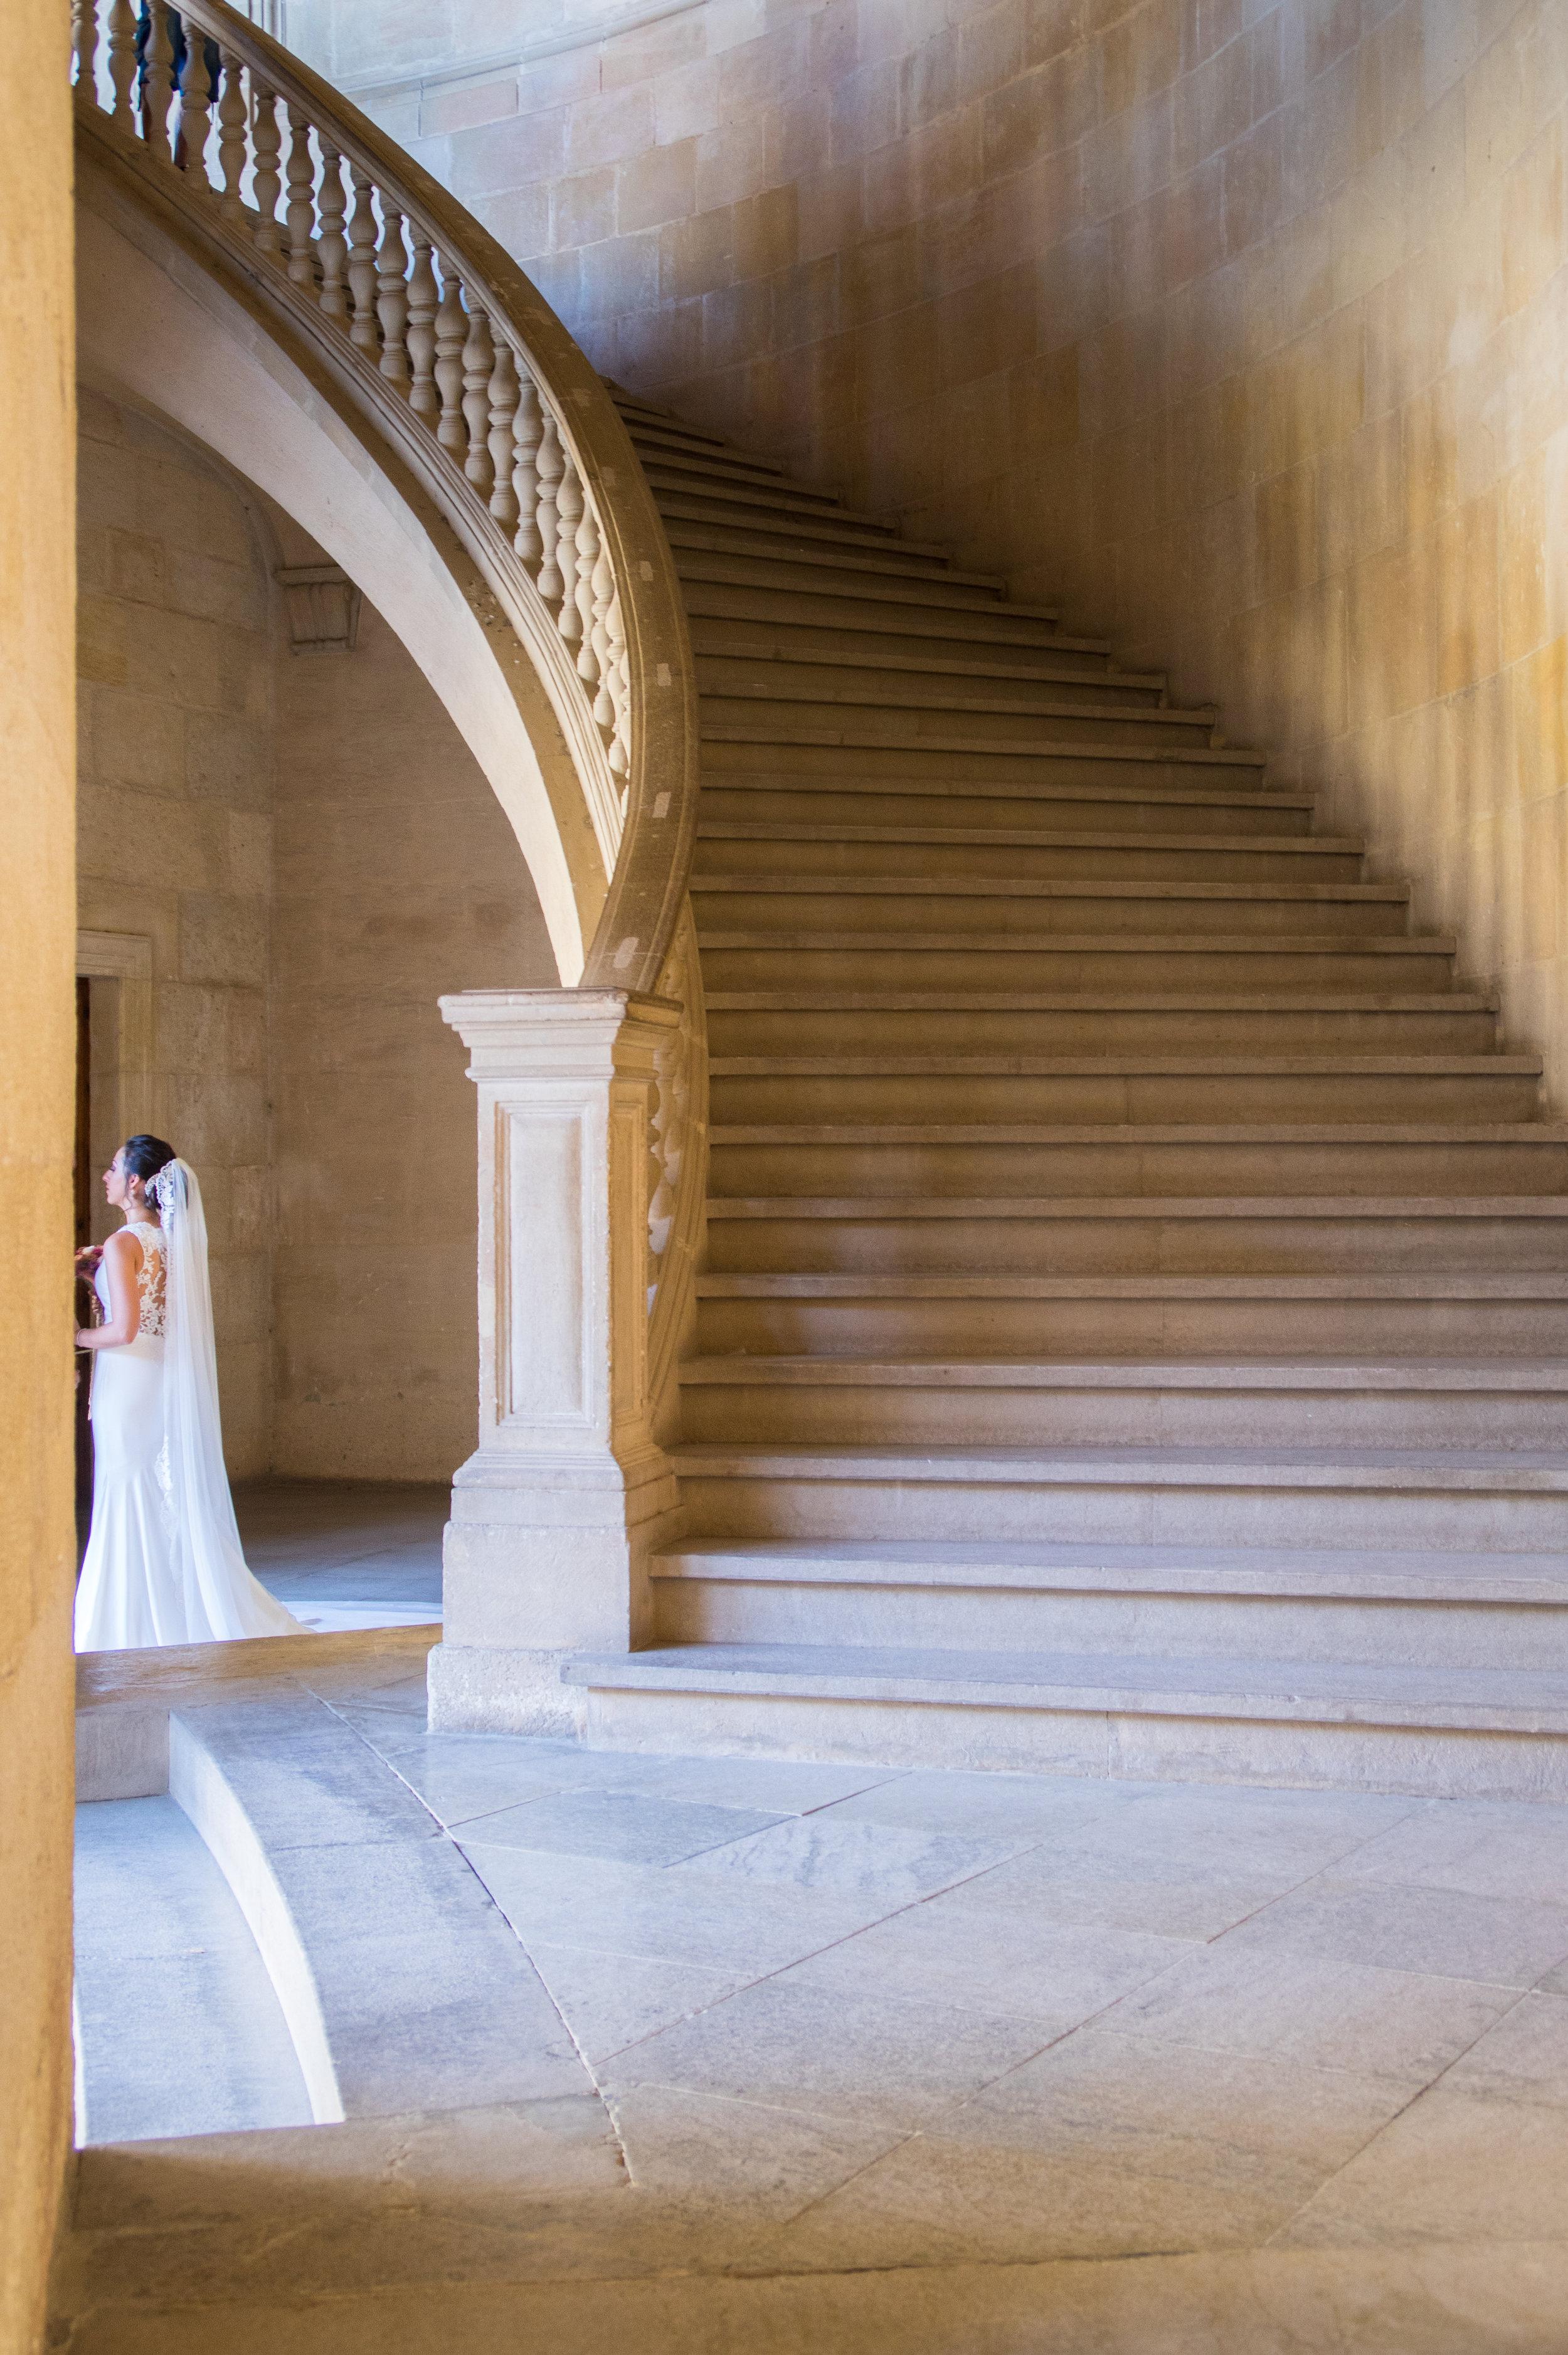 Palace Wedding - Alhambra, Spain